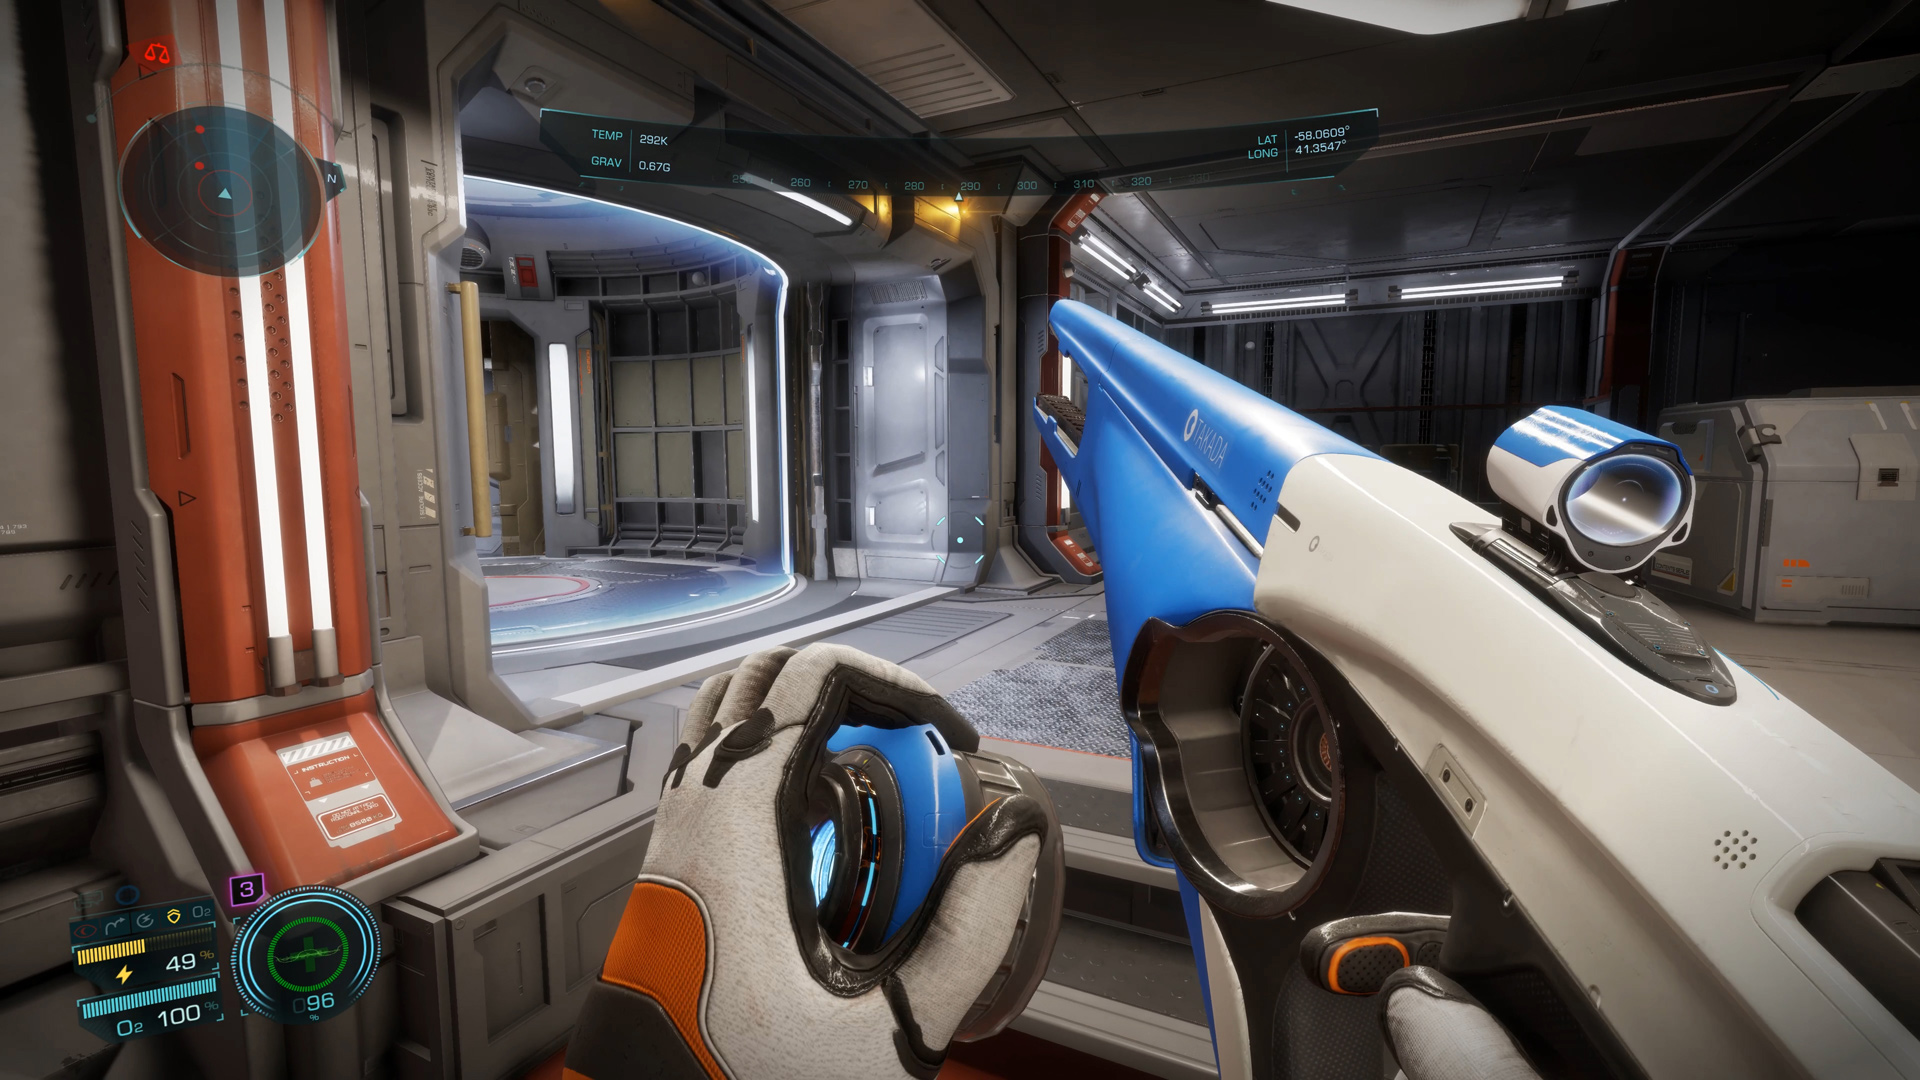 gameplay-reveal-screen-1-jpg.210321